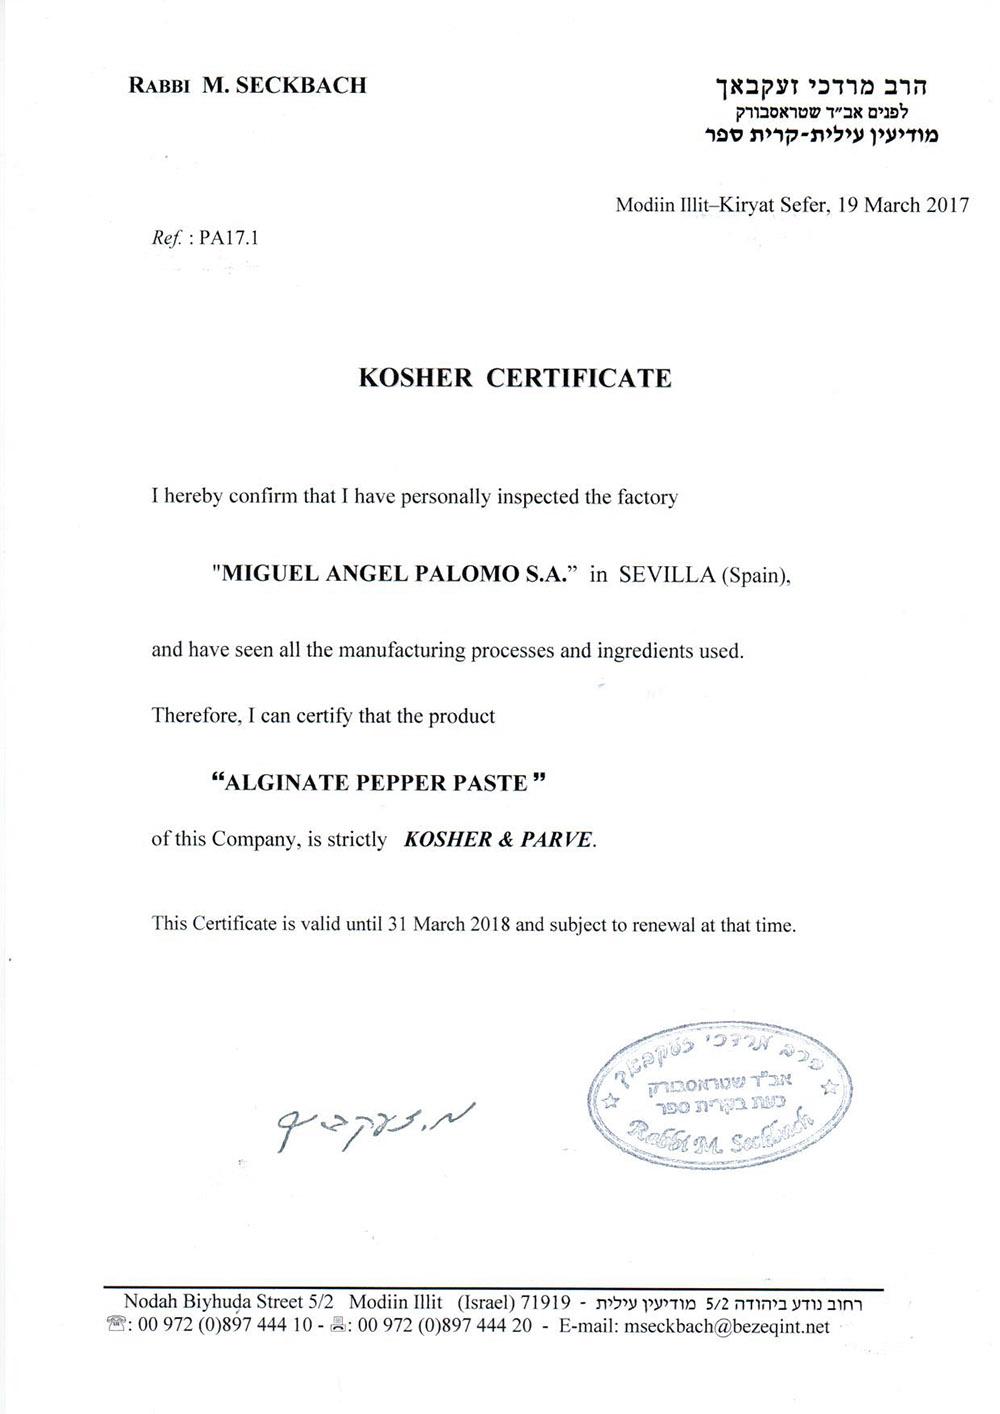 Kosher-Certificate-MAPSA-DH-2017-2018